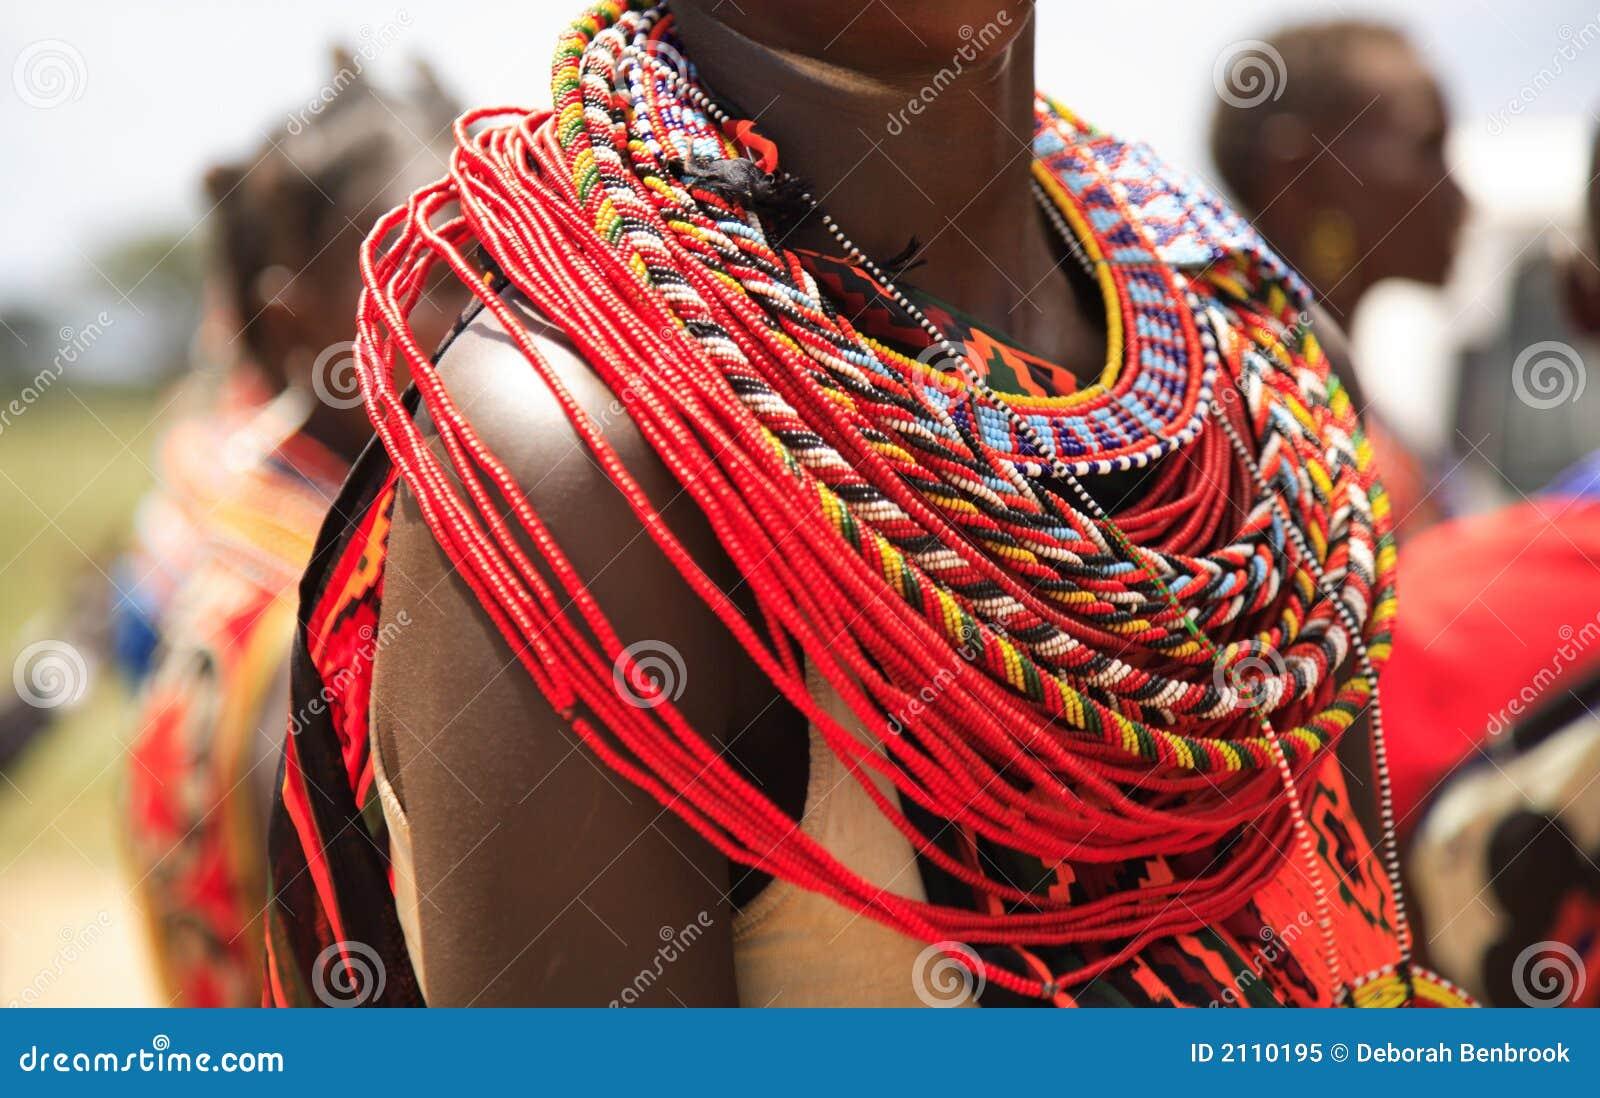 африканский jewellery